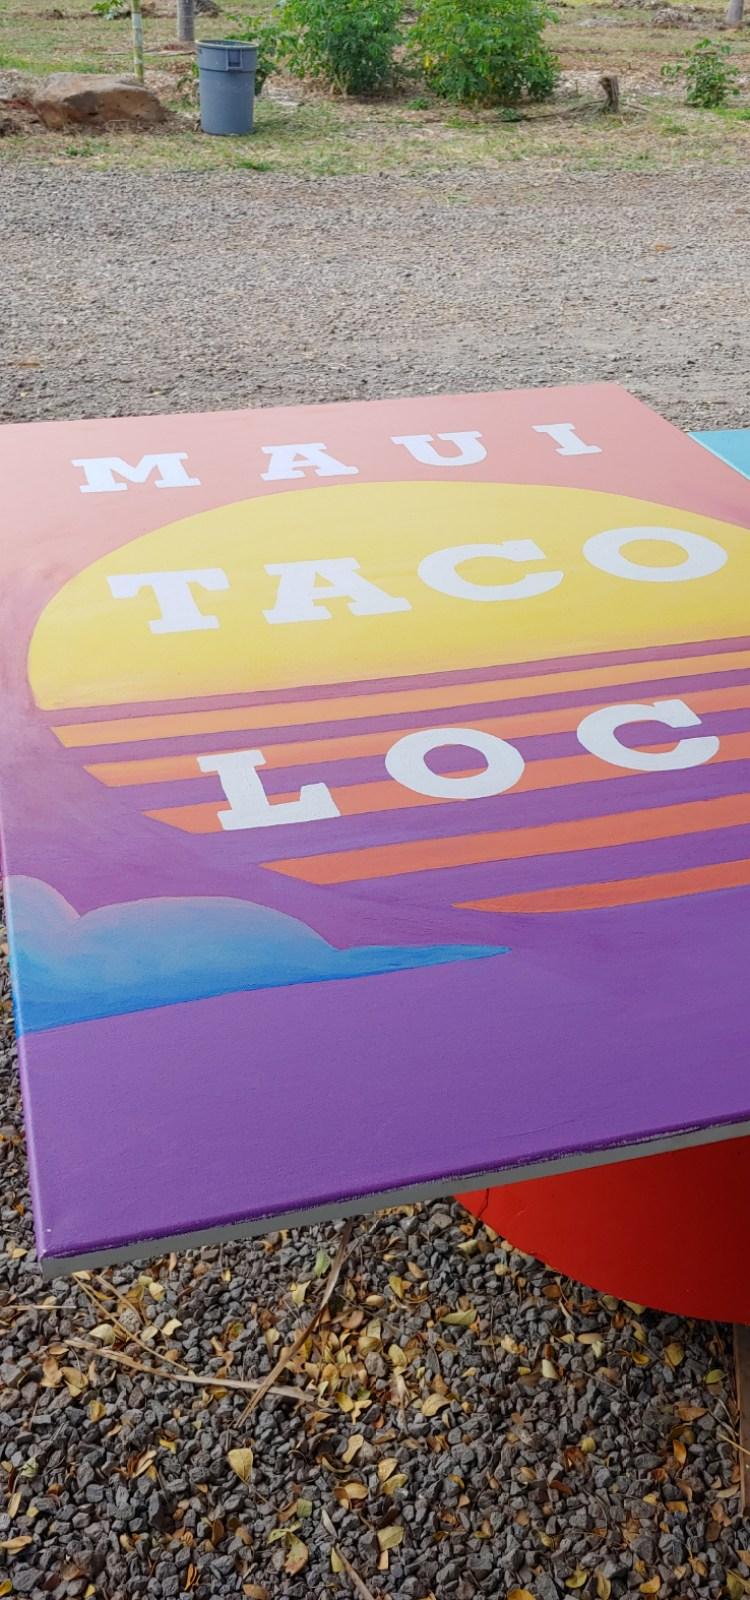 Maui taco loco handpainted sign